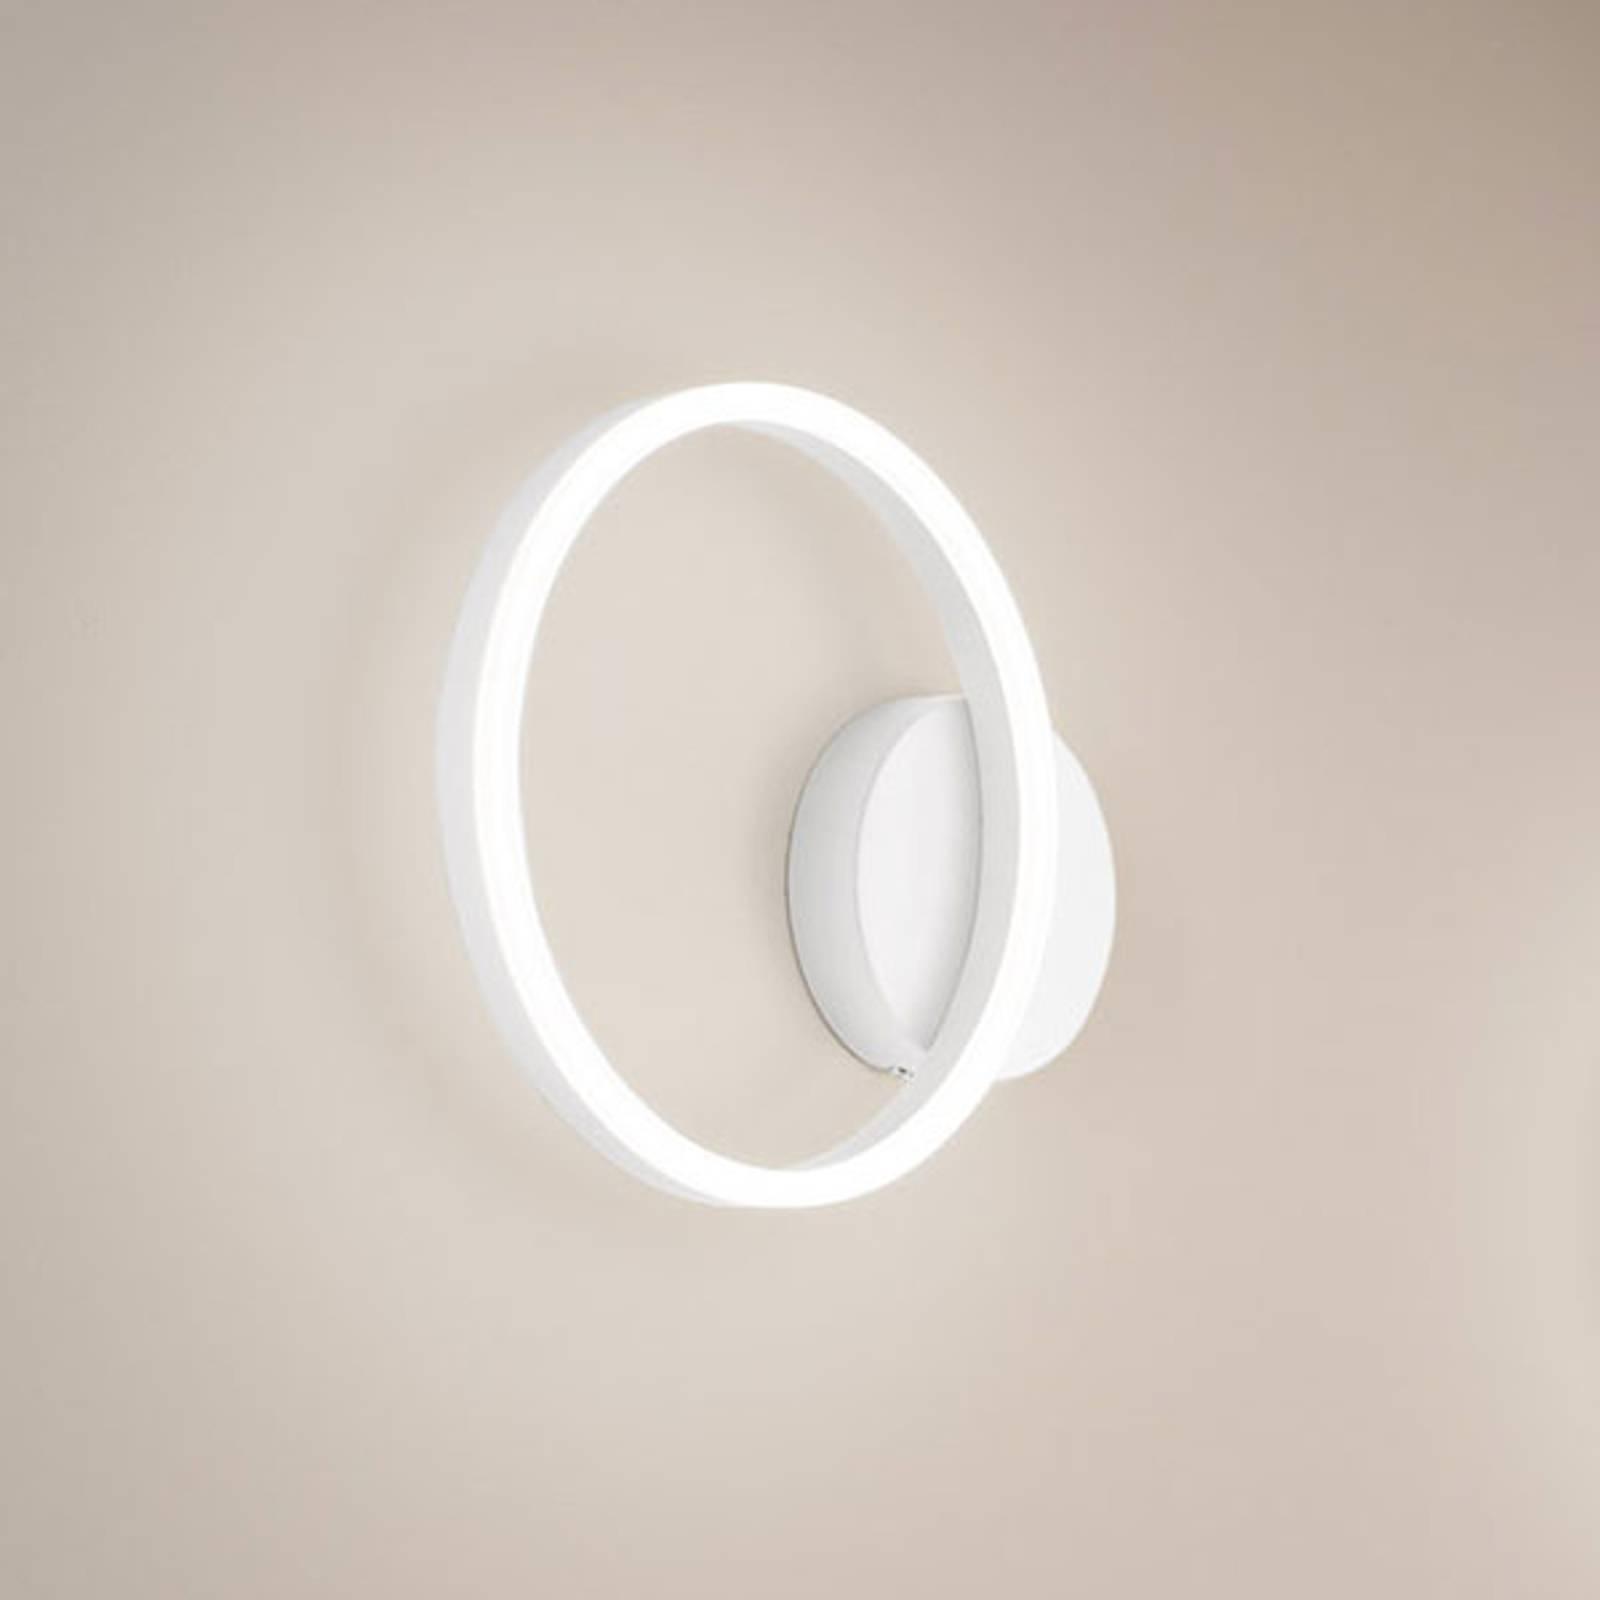 LED-Wandleuchte Giotto, einflammig, weiß